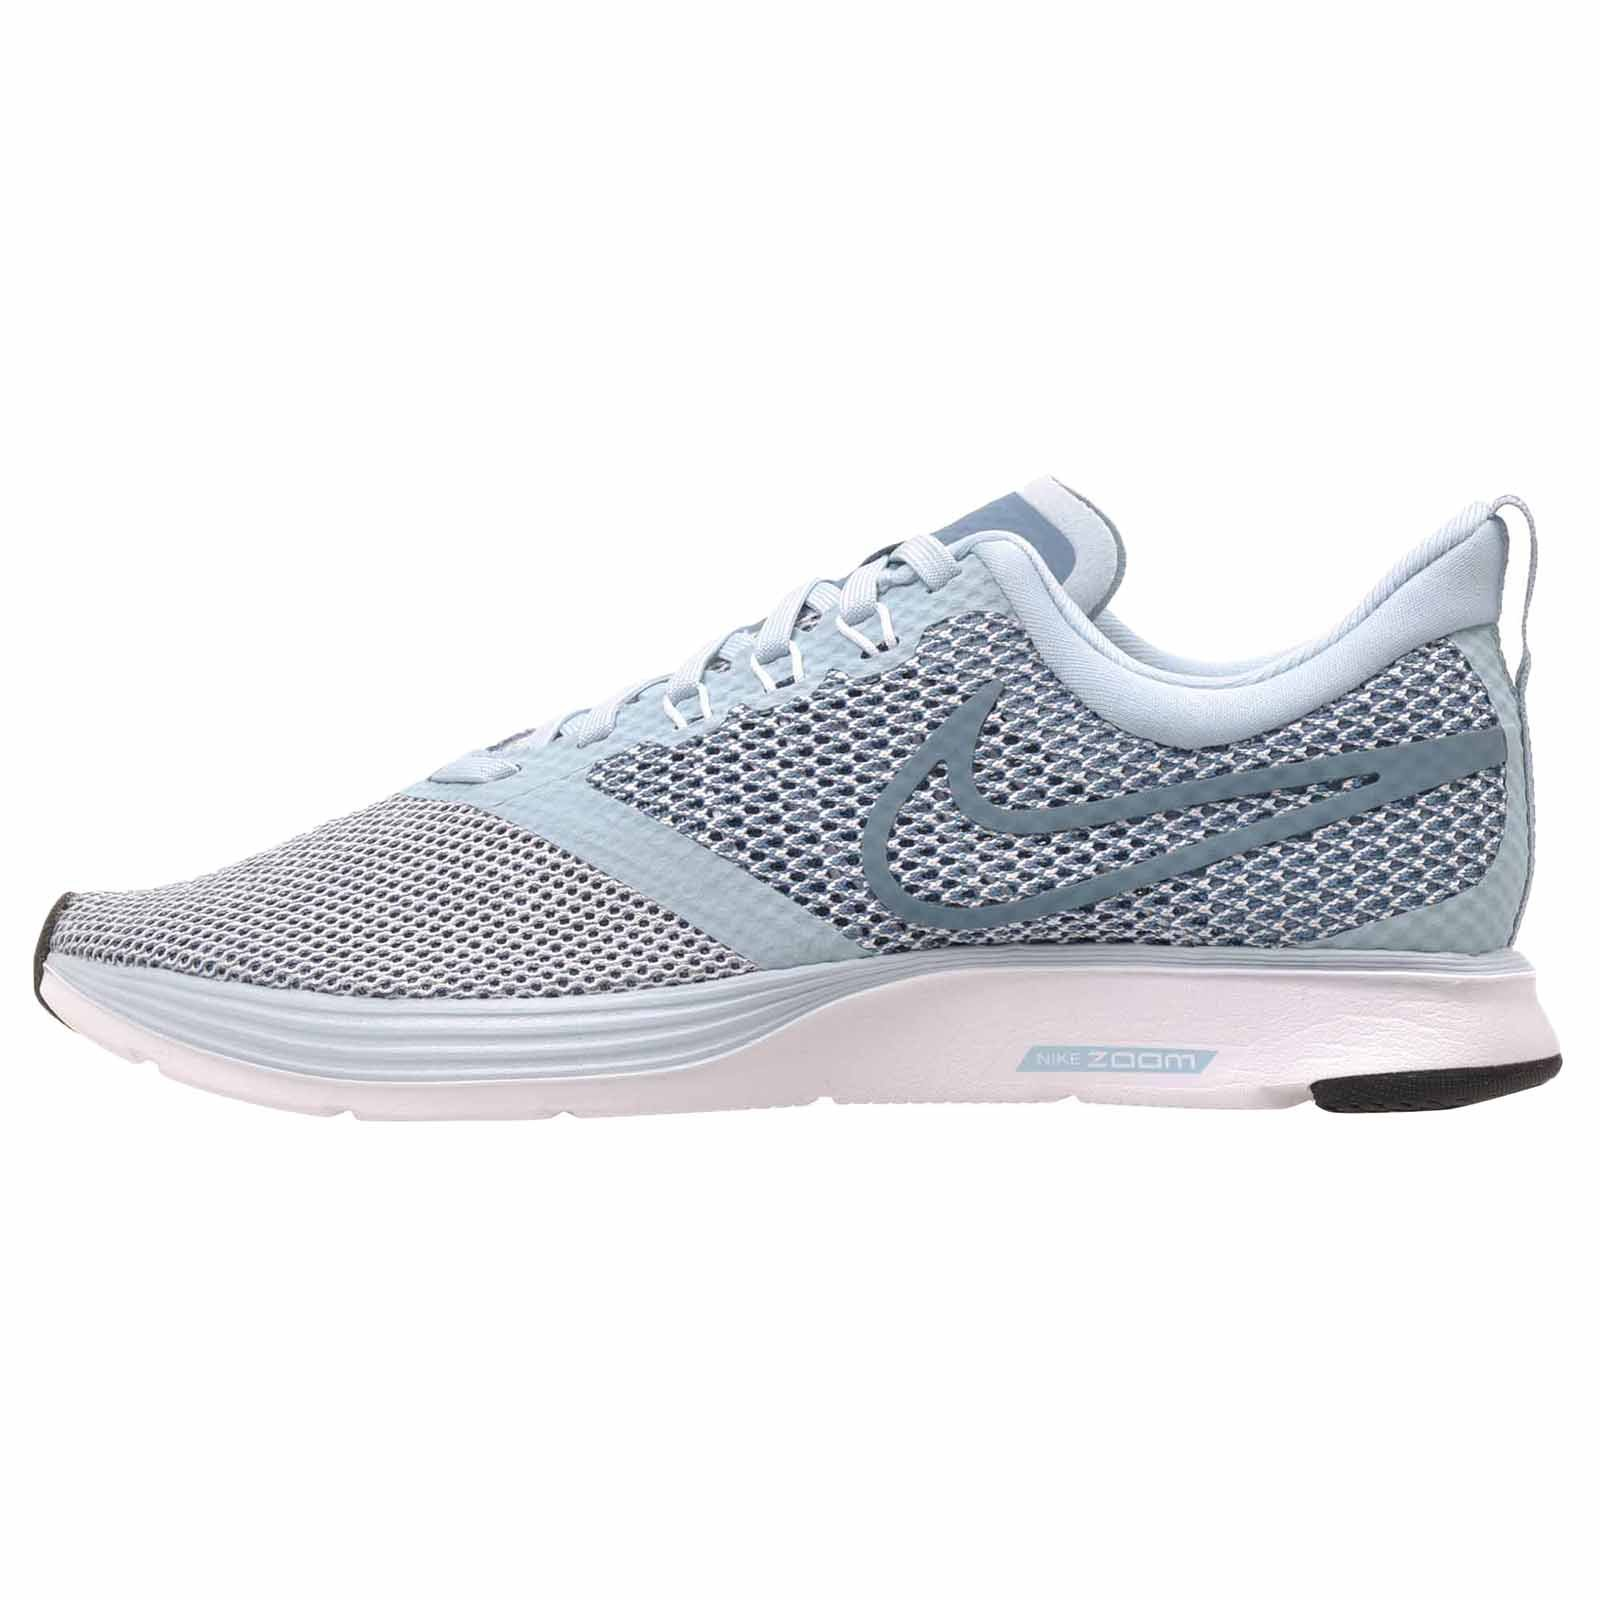 4ebf3efaaea0b Nike Women's Zoom Strike Running Shoe (7 B(M) US, Ocean Bliss/Noise  Aqua/White/Black)